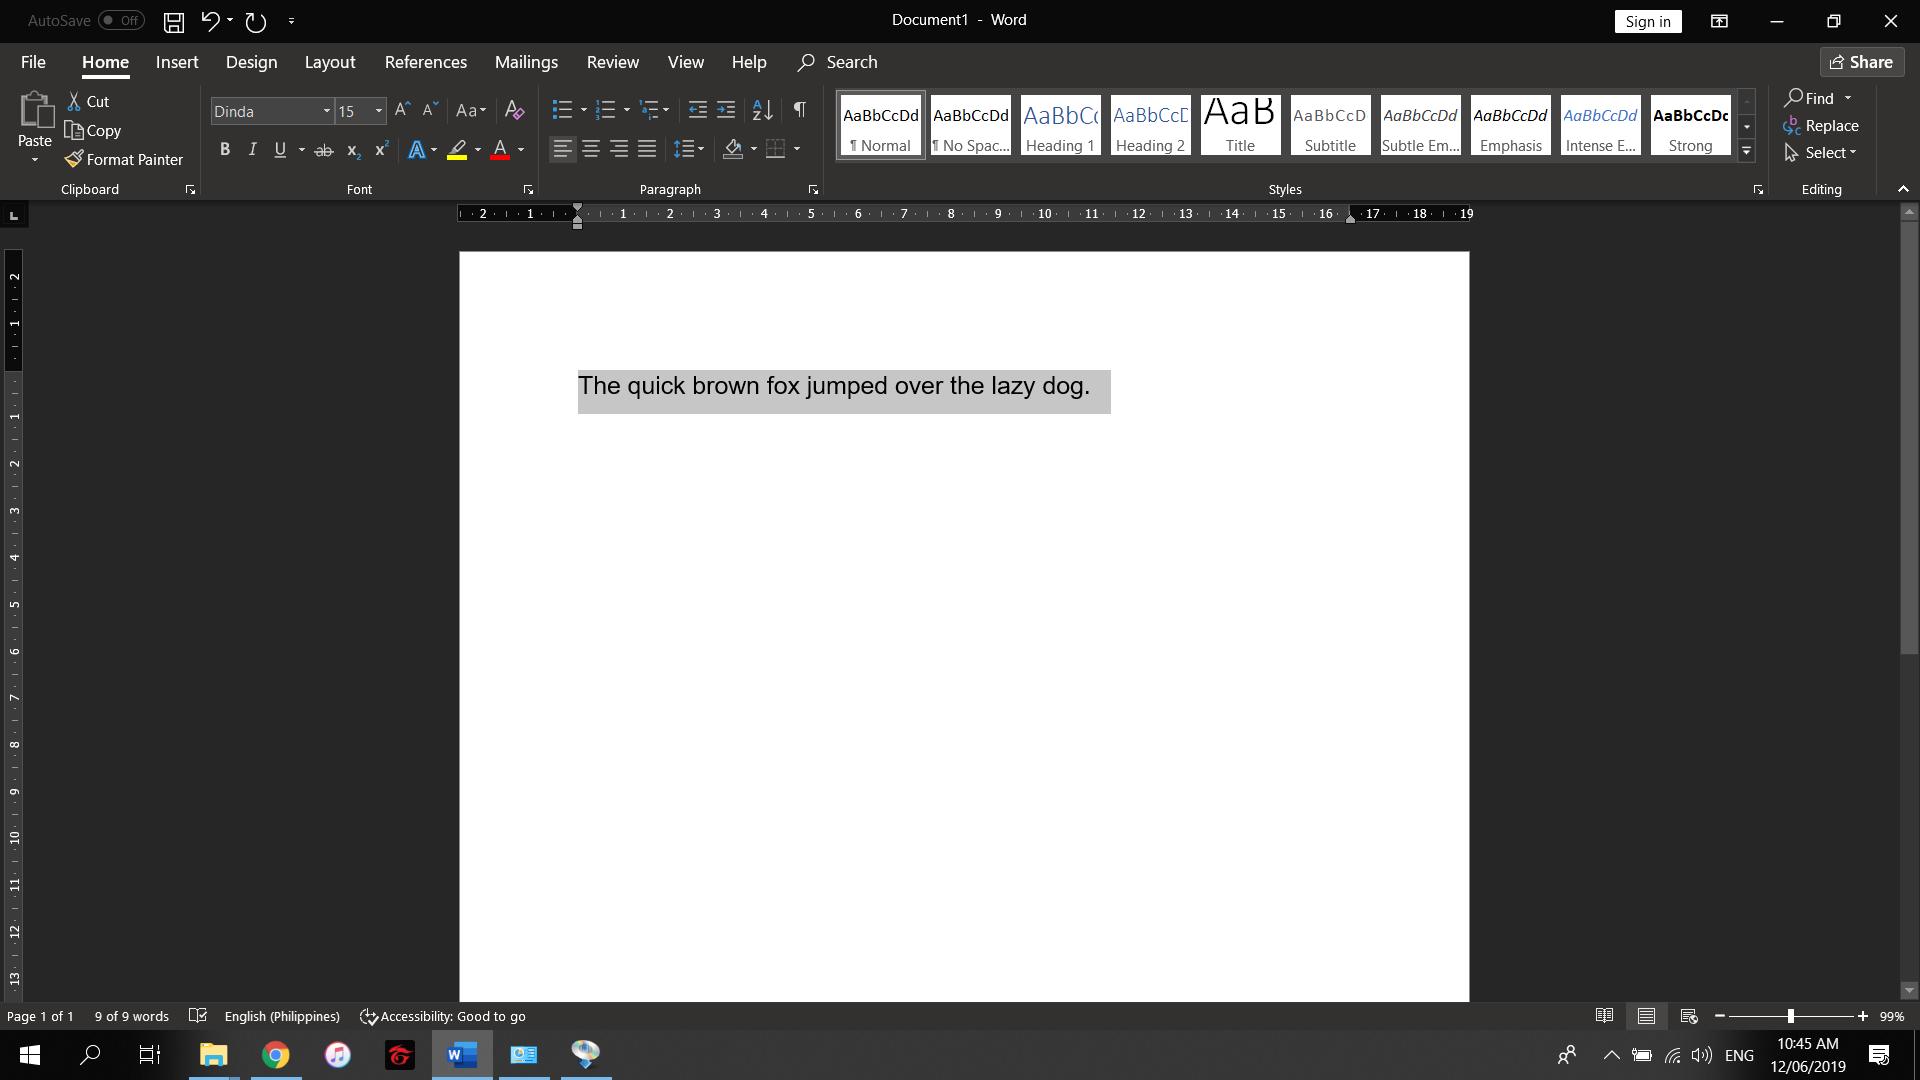 Installed Fonts Won't Apply in Word in Windows 10 68857fb9-f7e1-49cc-800f-da2b739aae38?upload=true.png